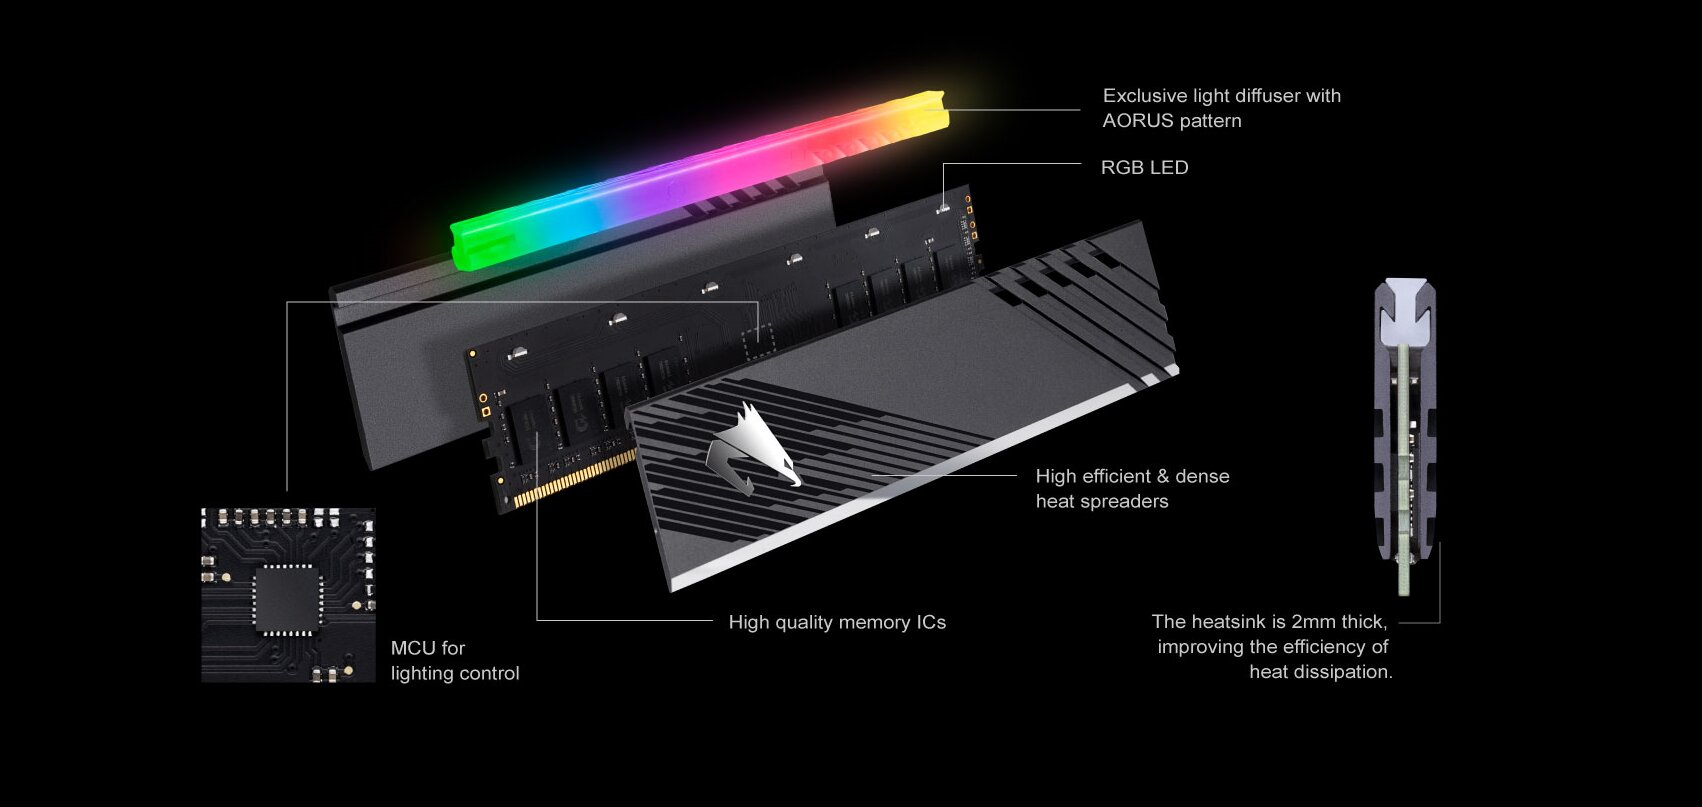 Gigabyte Aorus RGB - Design